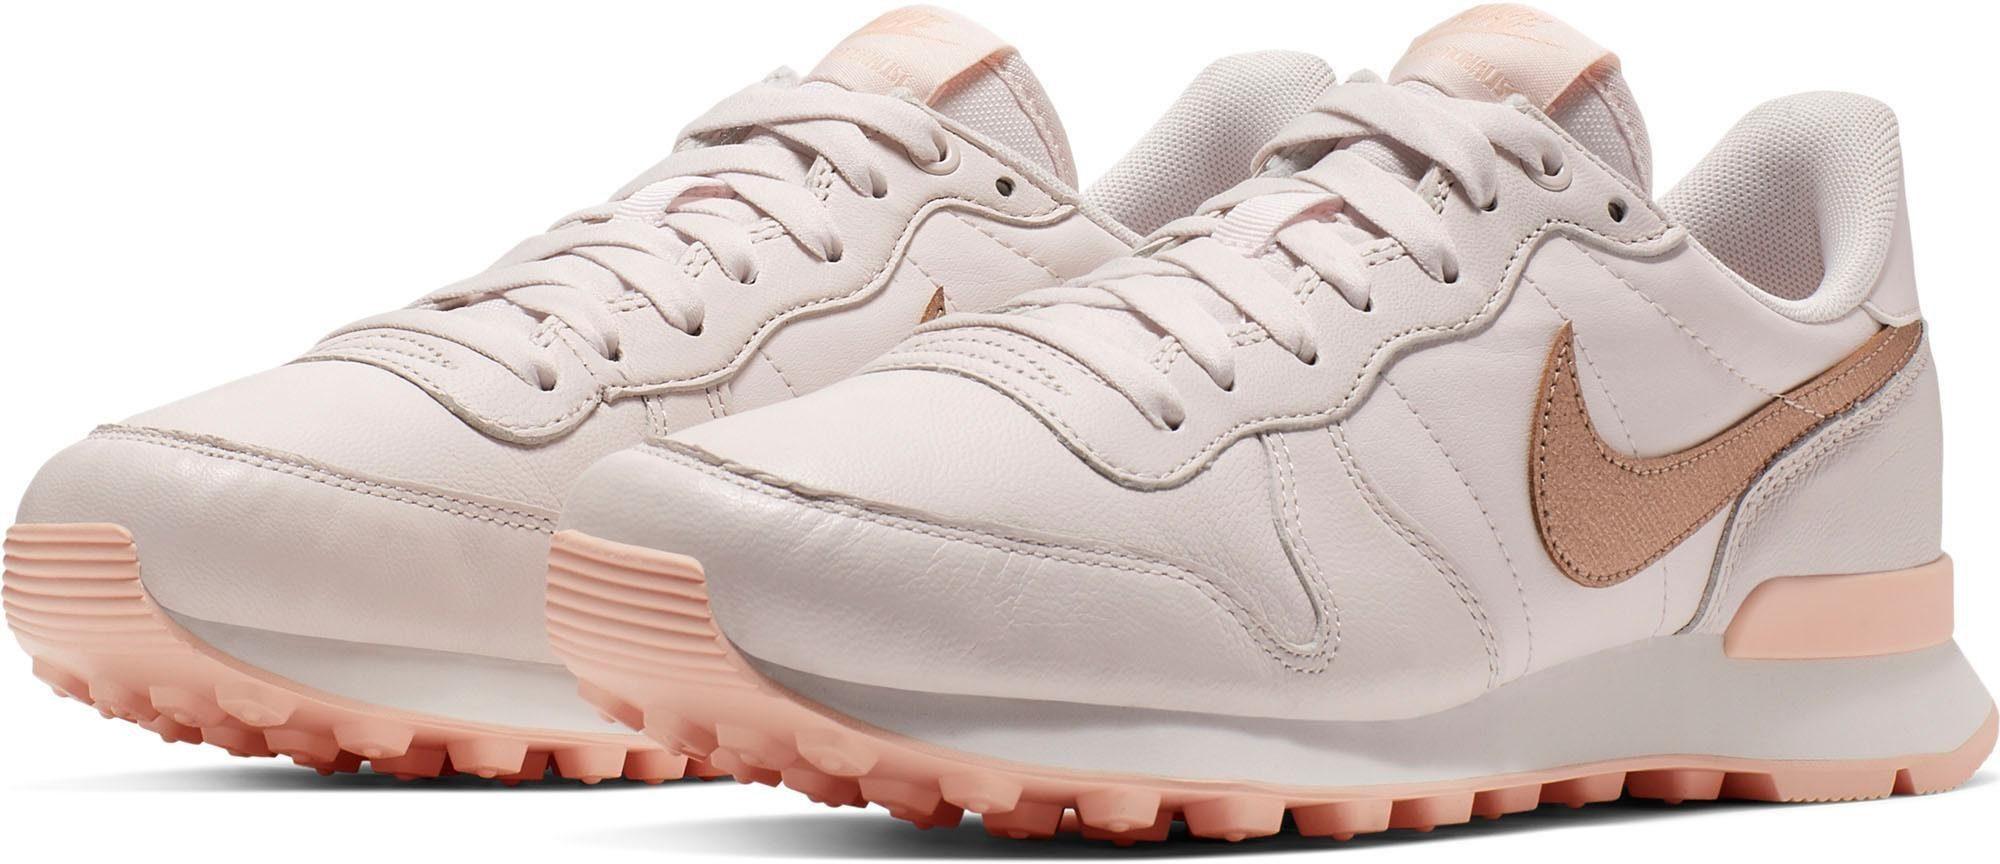 Nike Sportswear »Internationalist Premium« Sneaker | OTTO